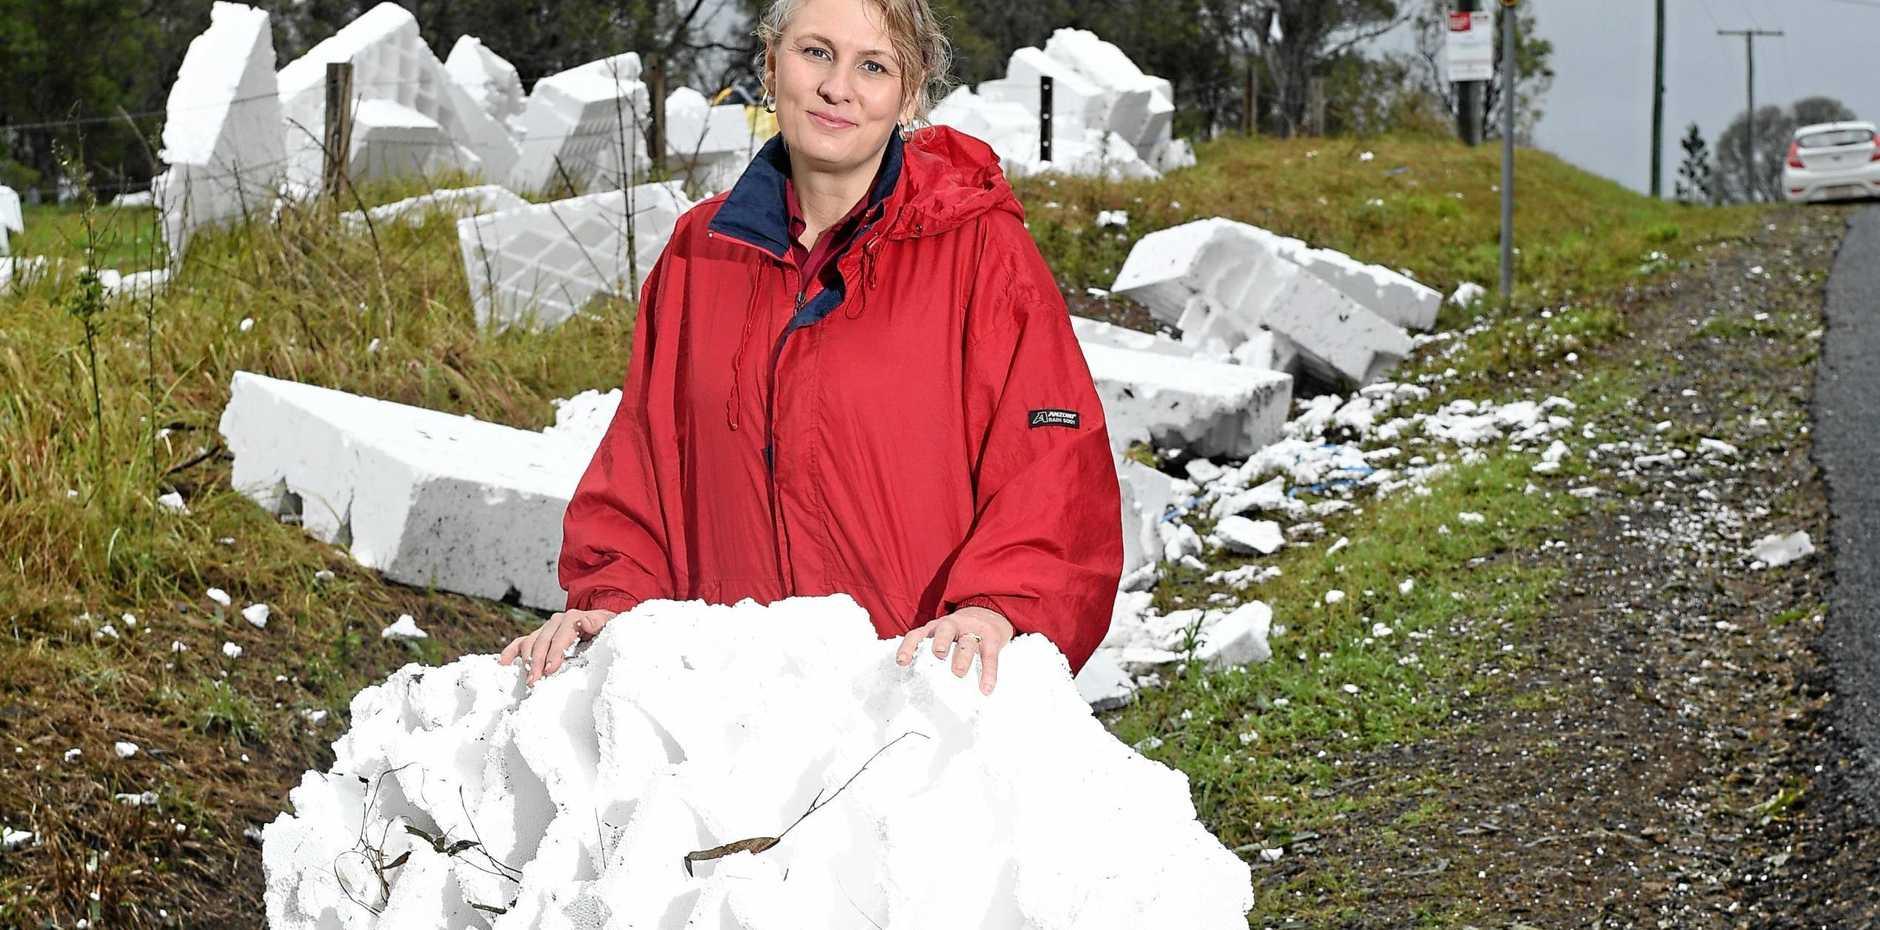 Denise Kapernick from GJ Gardner Homes on clean up after storm.